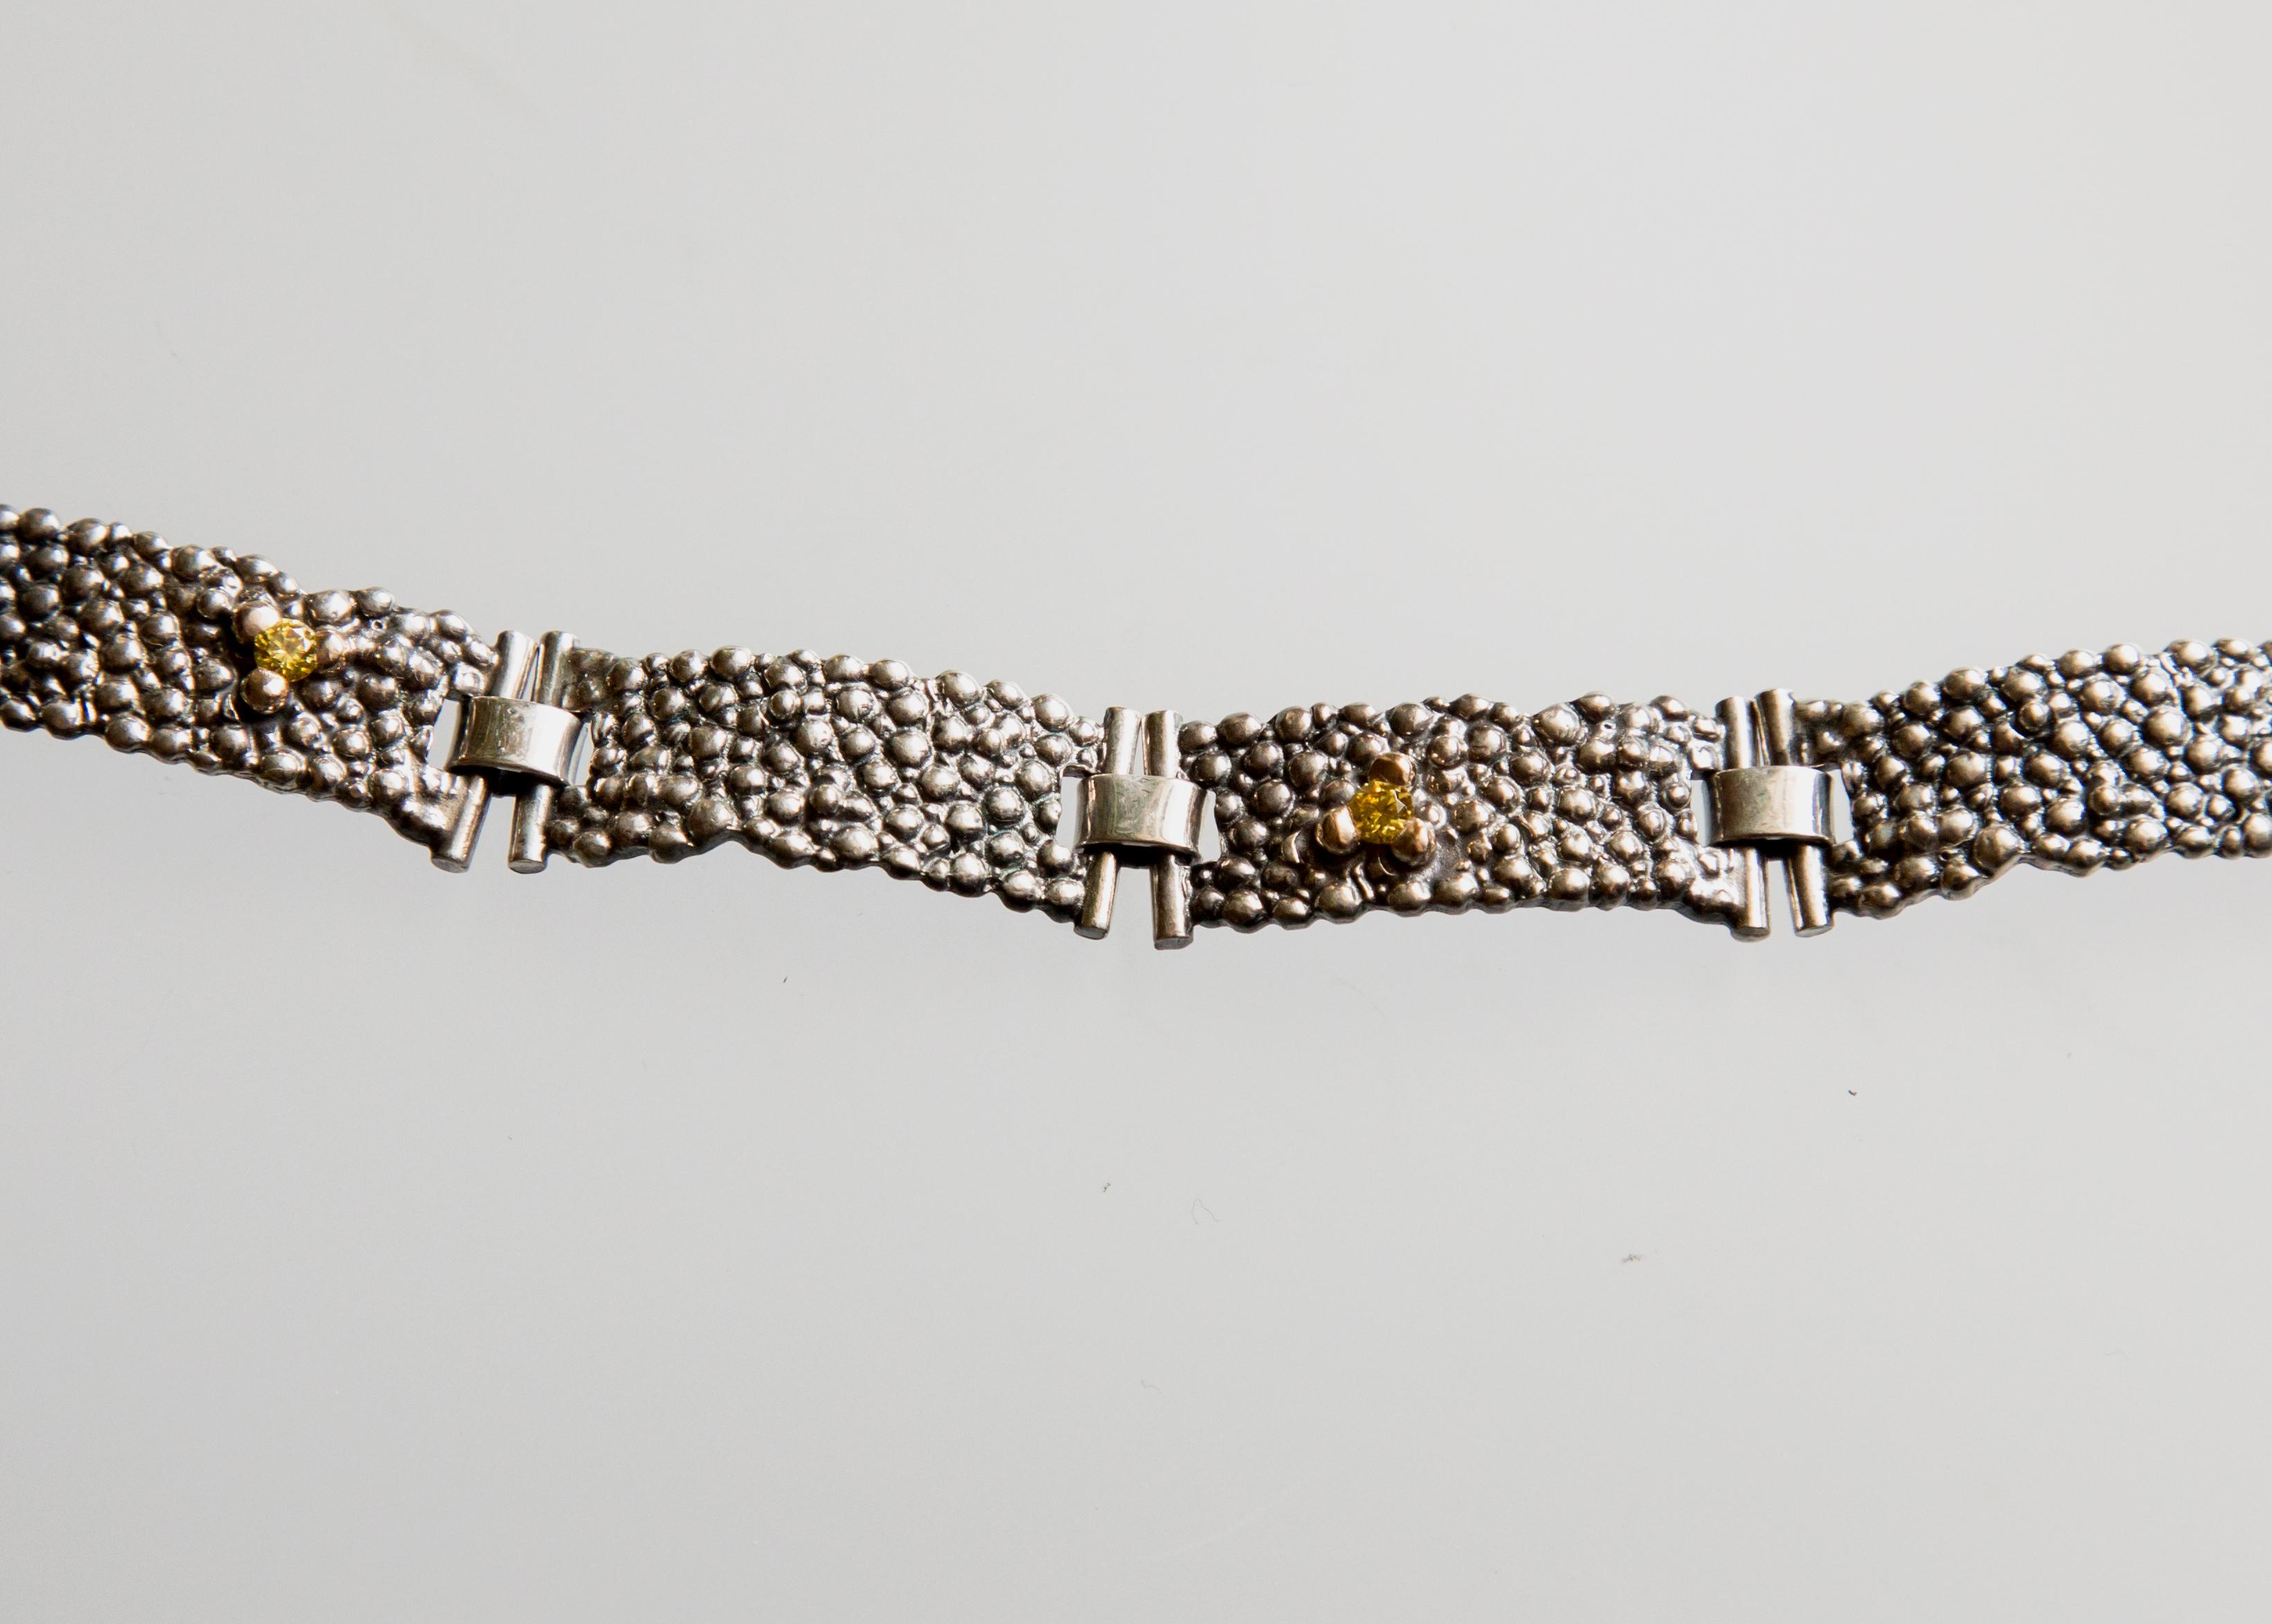 Srebrna bransoleta Płaszczka segmentowa